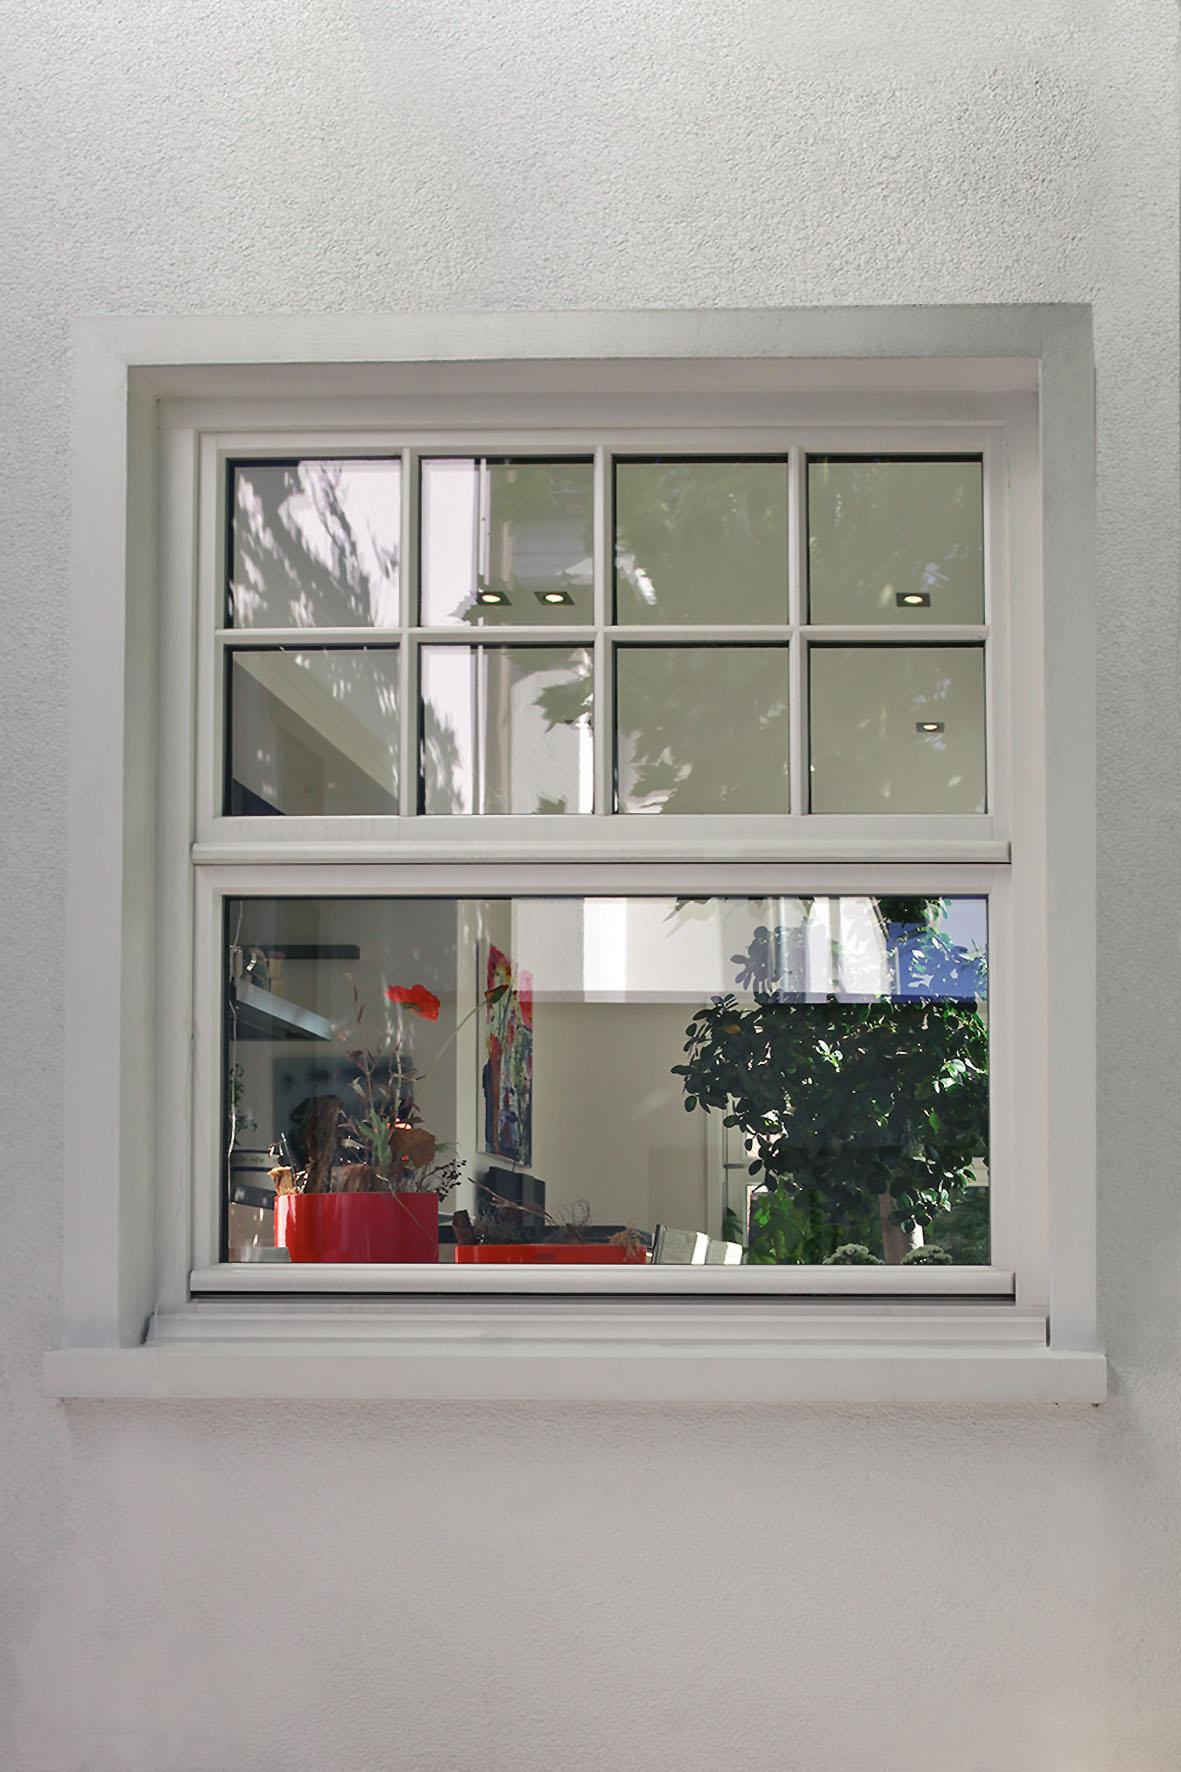 Vertikalfenster